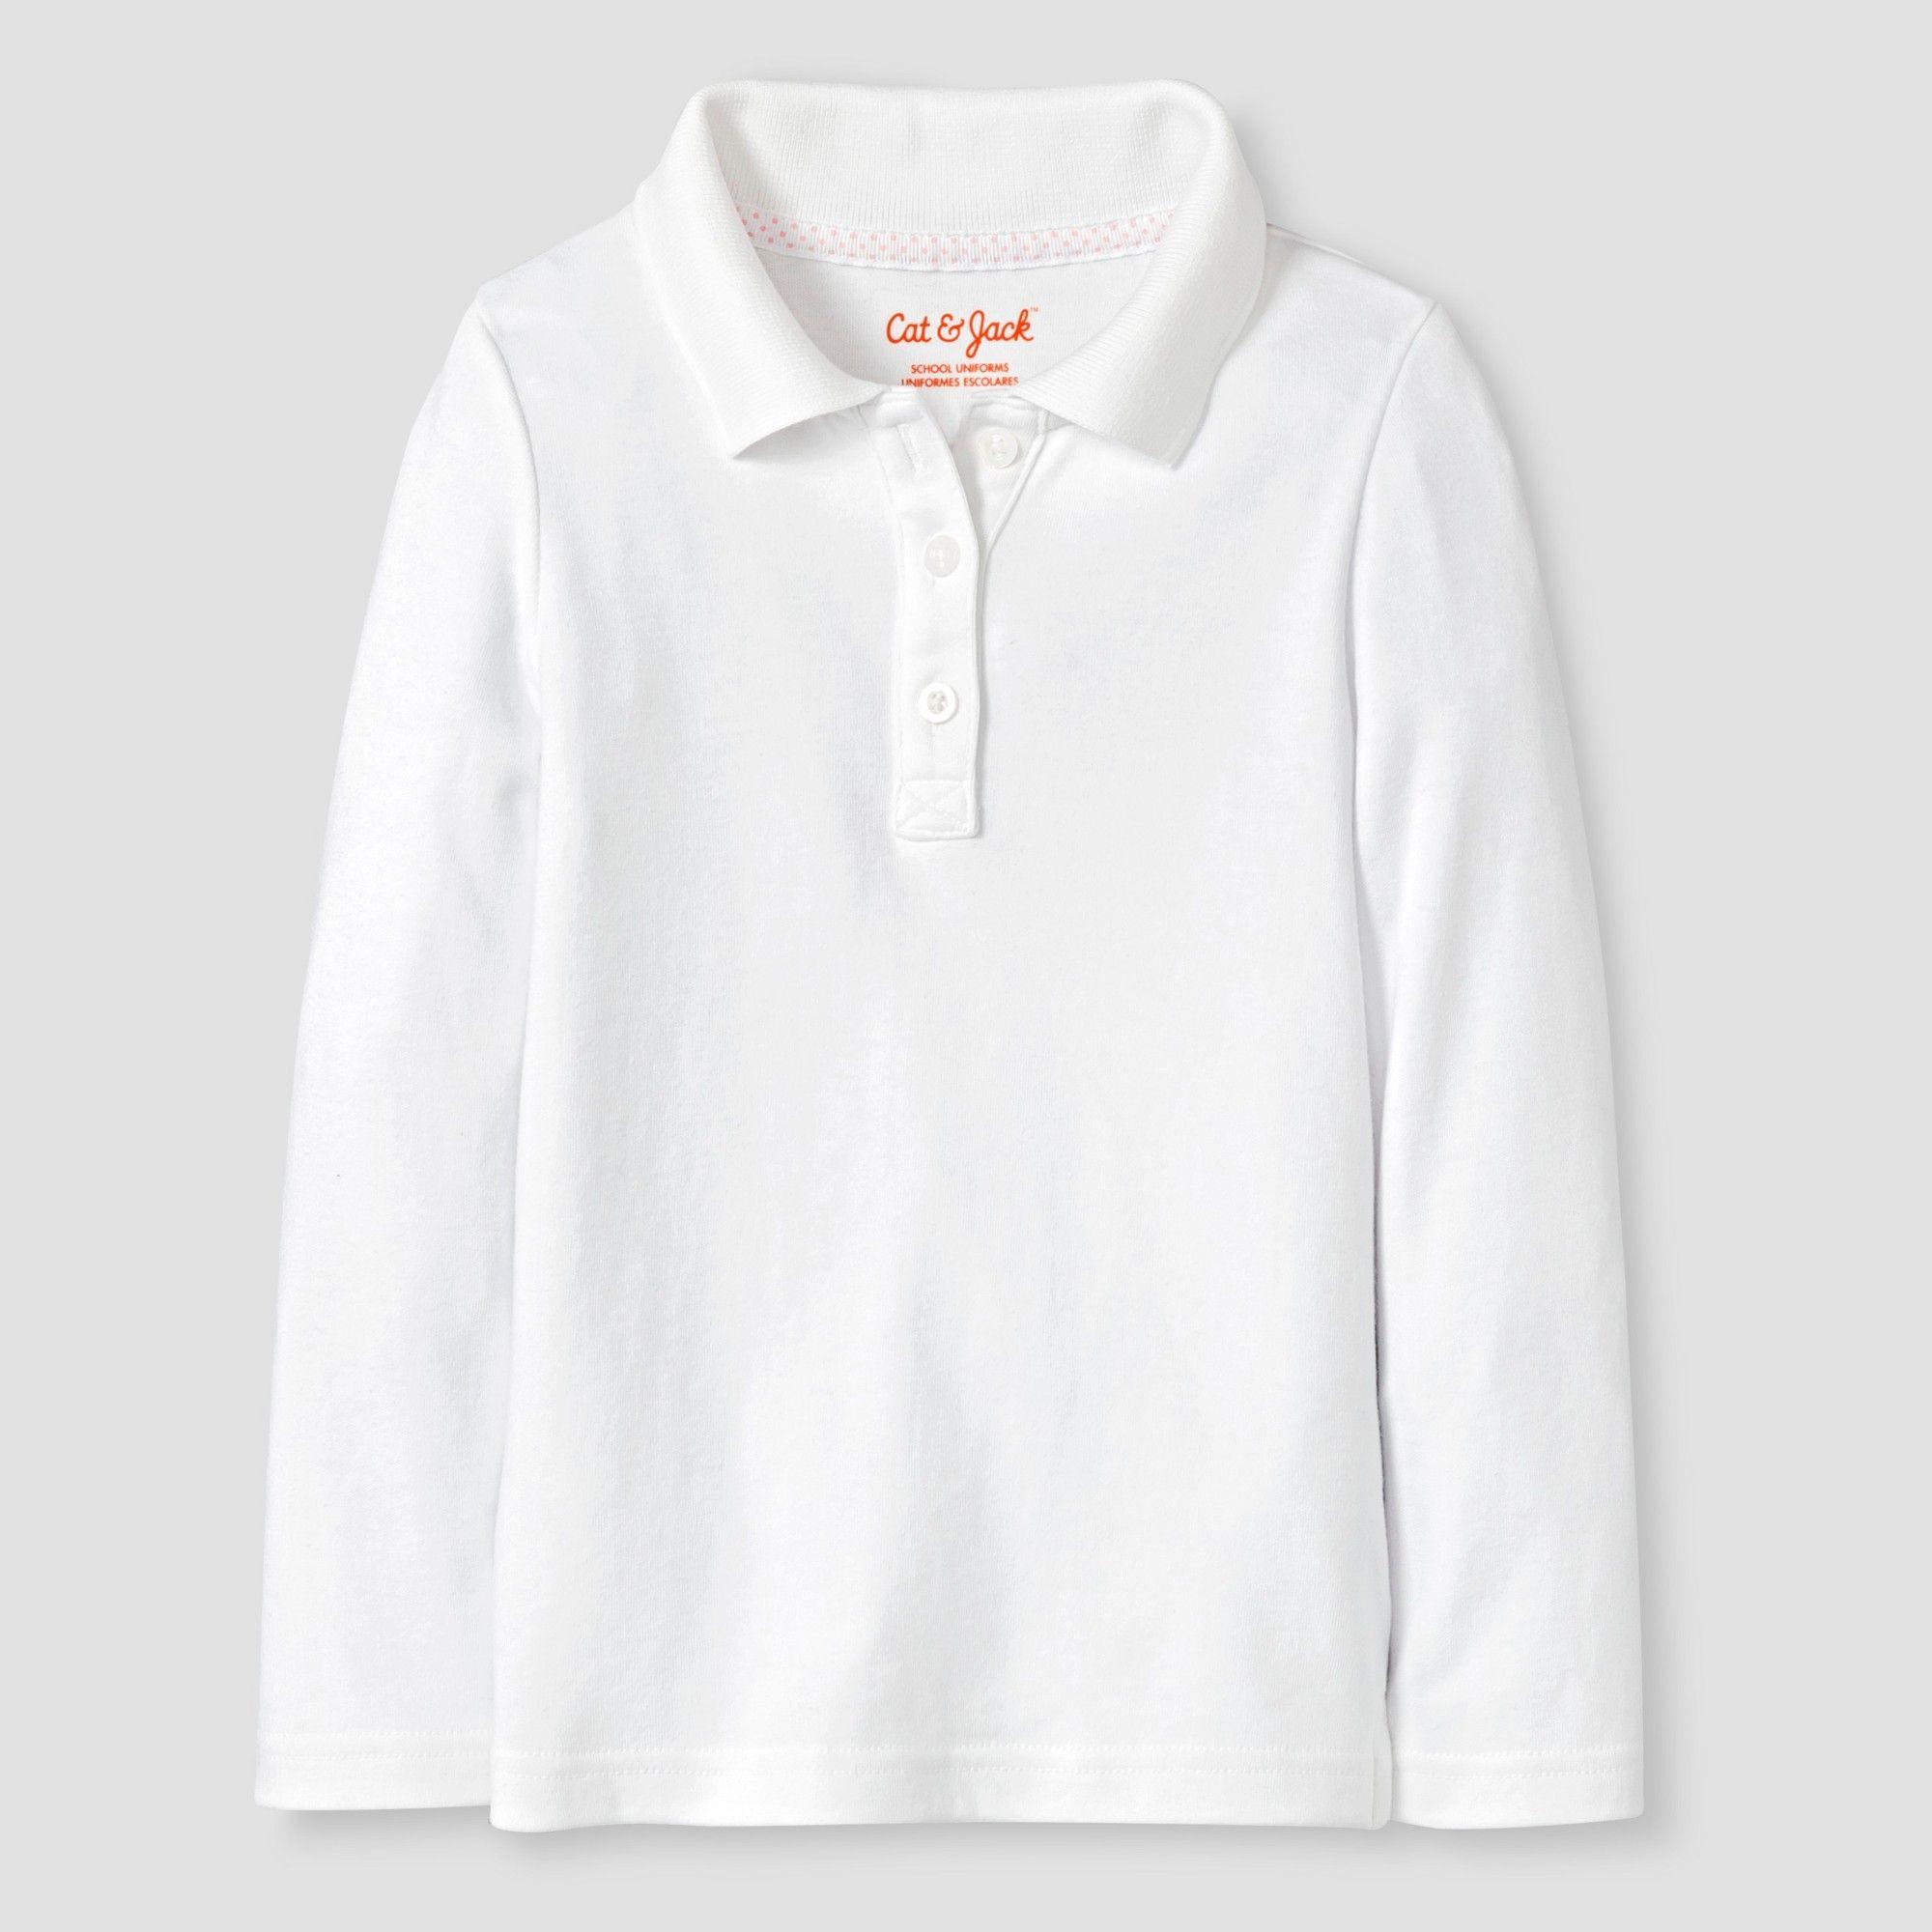 cc74d20c1 Toddler Girls' Long Sleeve Interlock Polo Shirt - Cat & Jack White ...